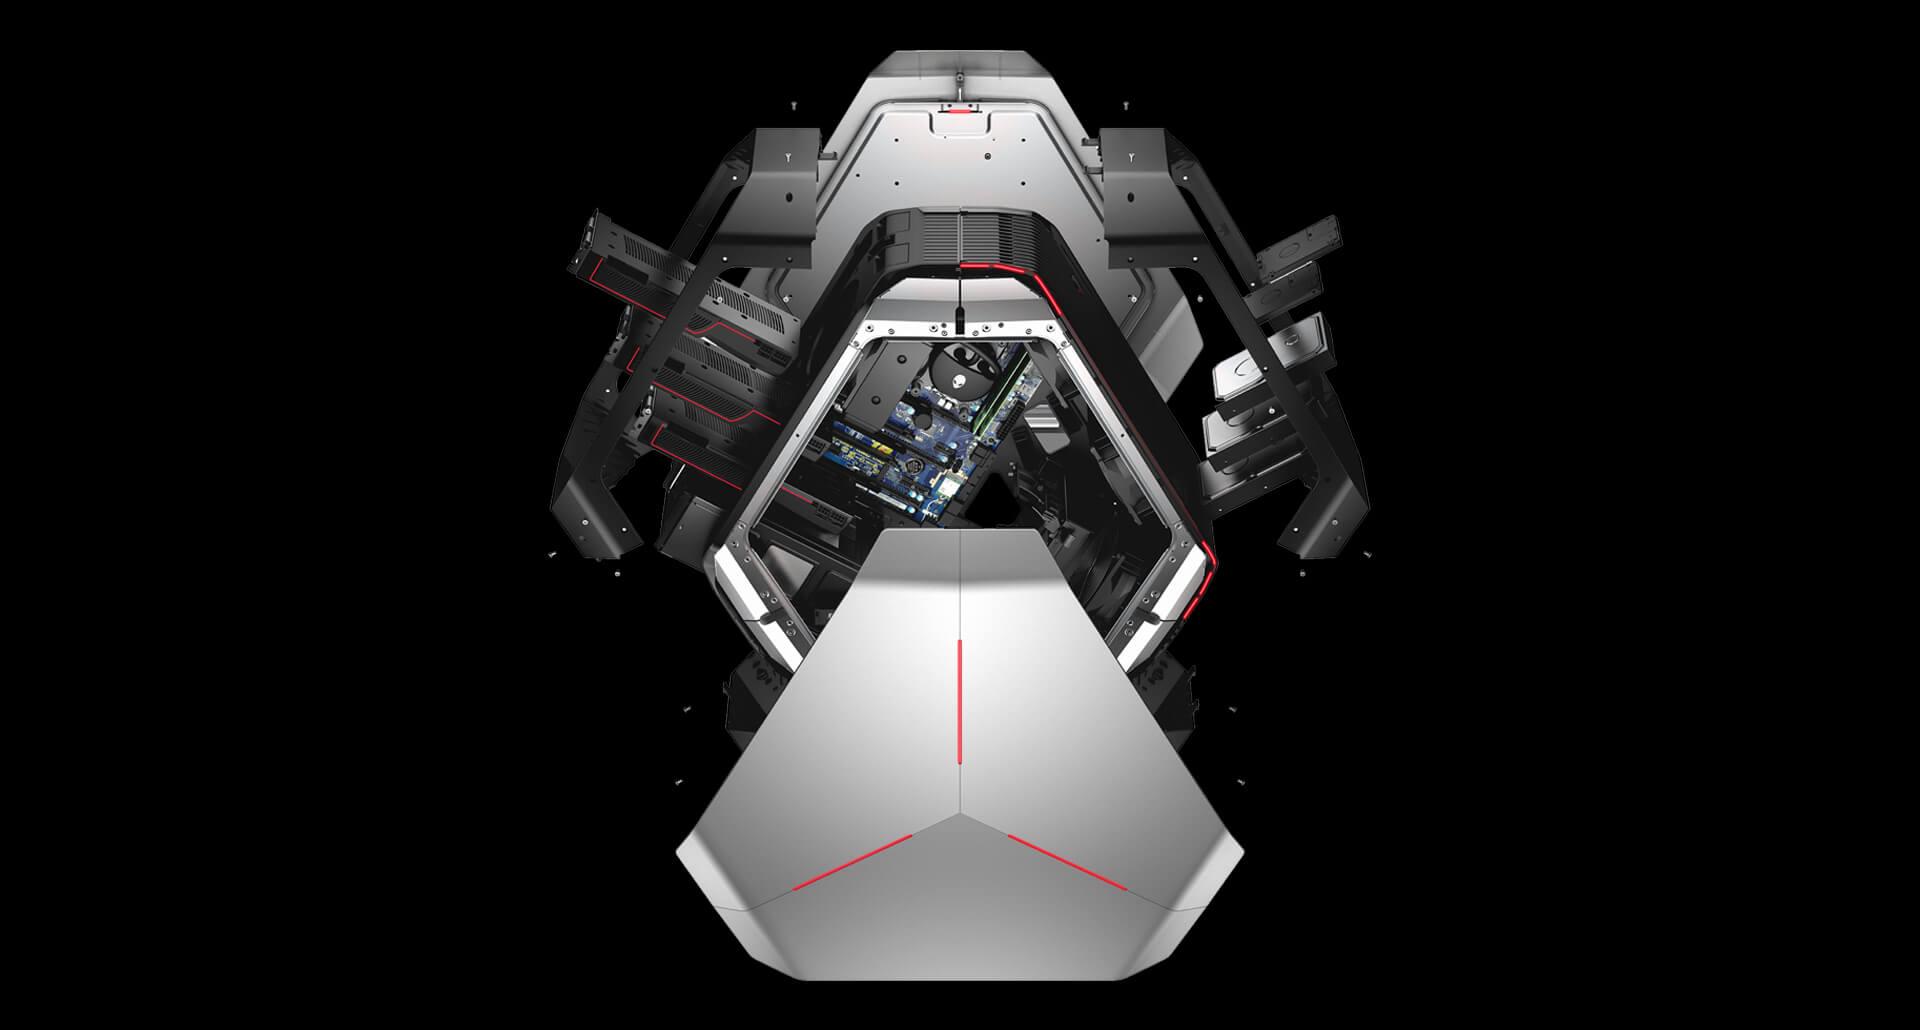 Dell Alienware Area-51 AMD Desktop BETA Display Windows 8 Driver Download